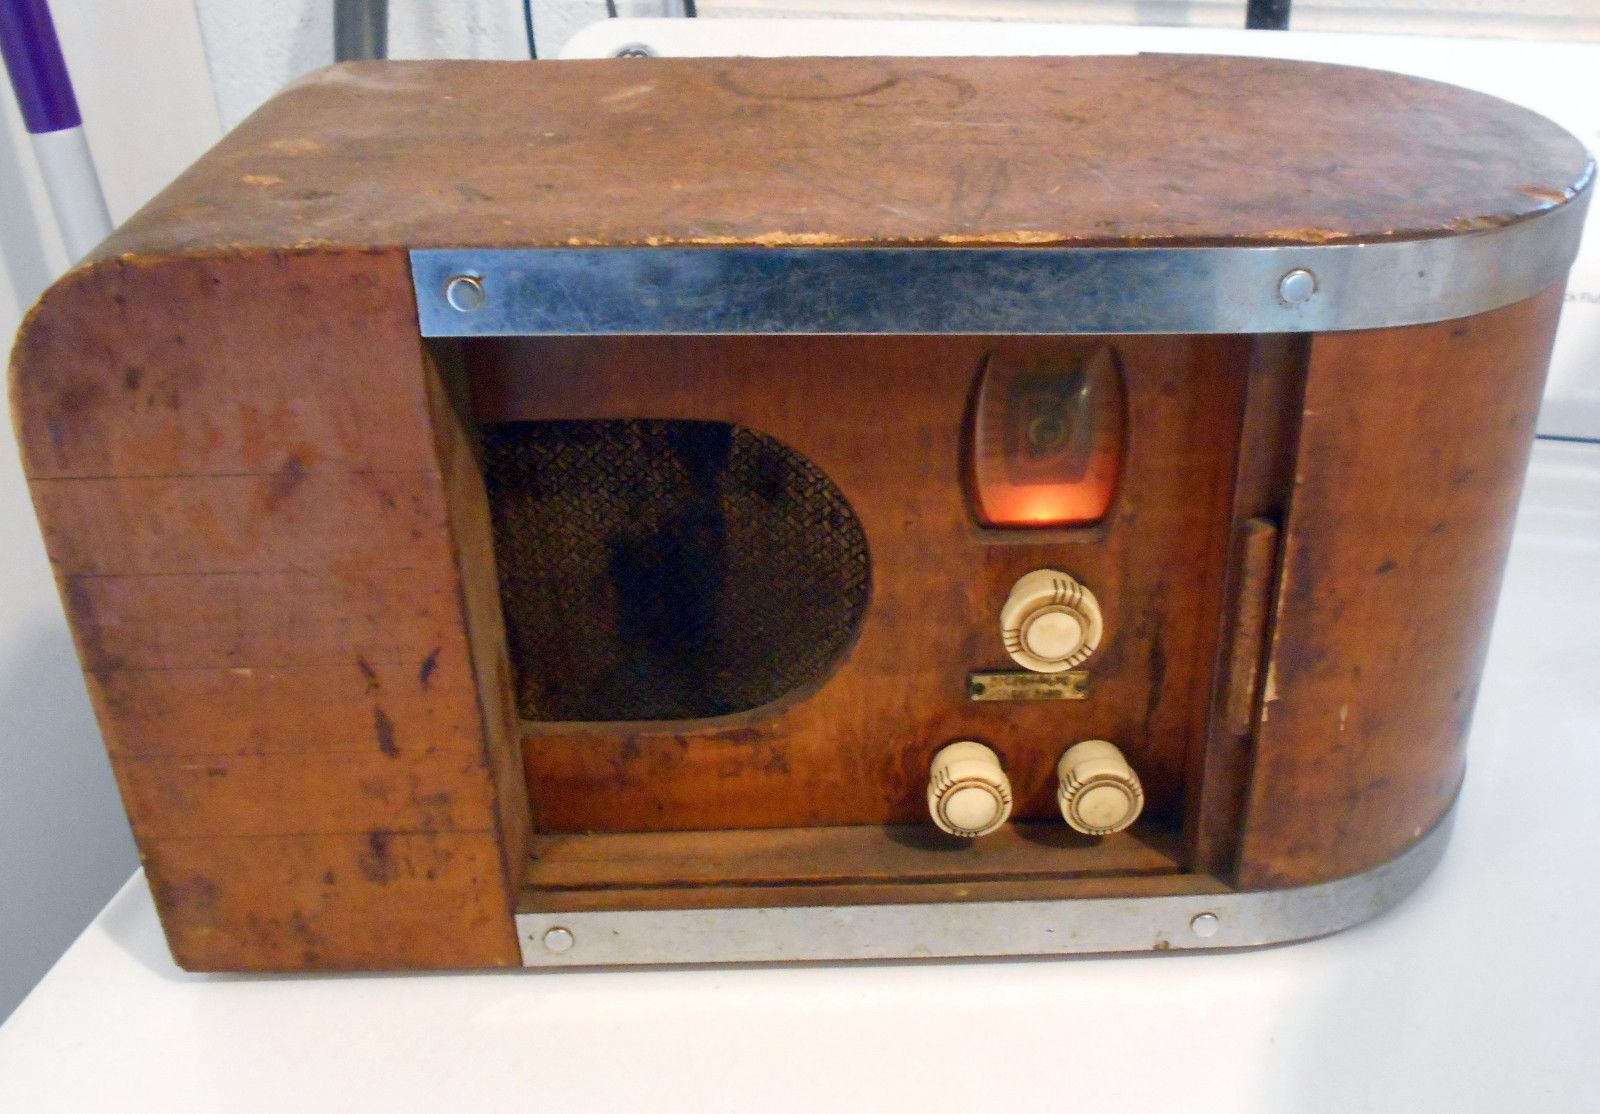 Vintage 1936 Dictograph Silent Radio Working Art Deco Style Tube Radio Ebay Retro Radios Vintage Radio Old Radios